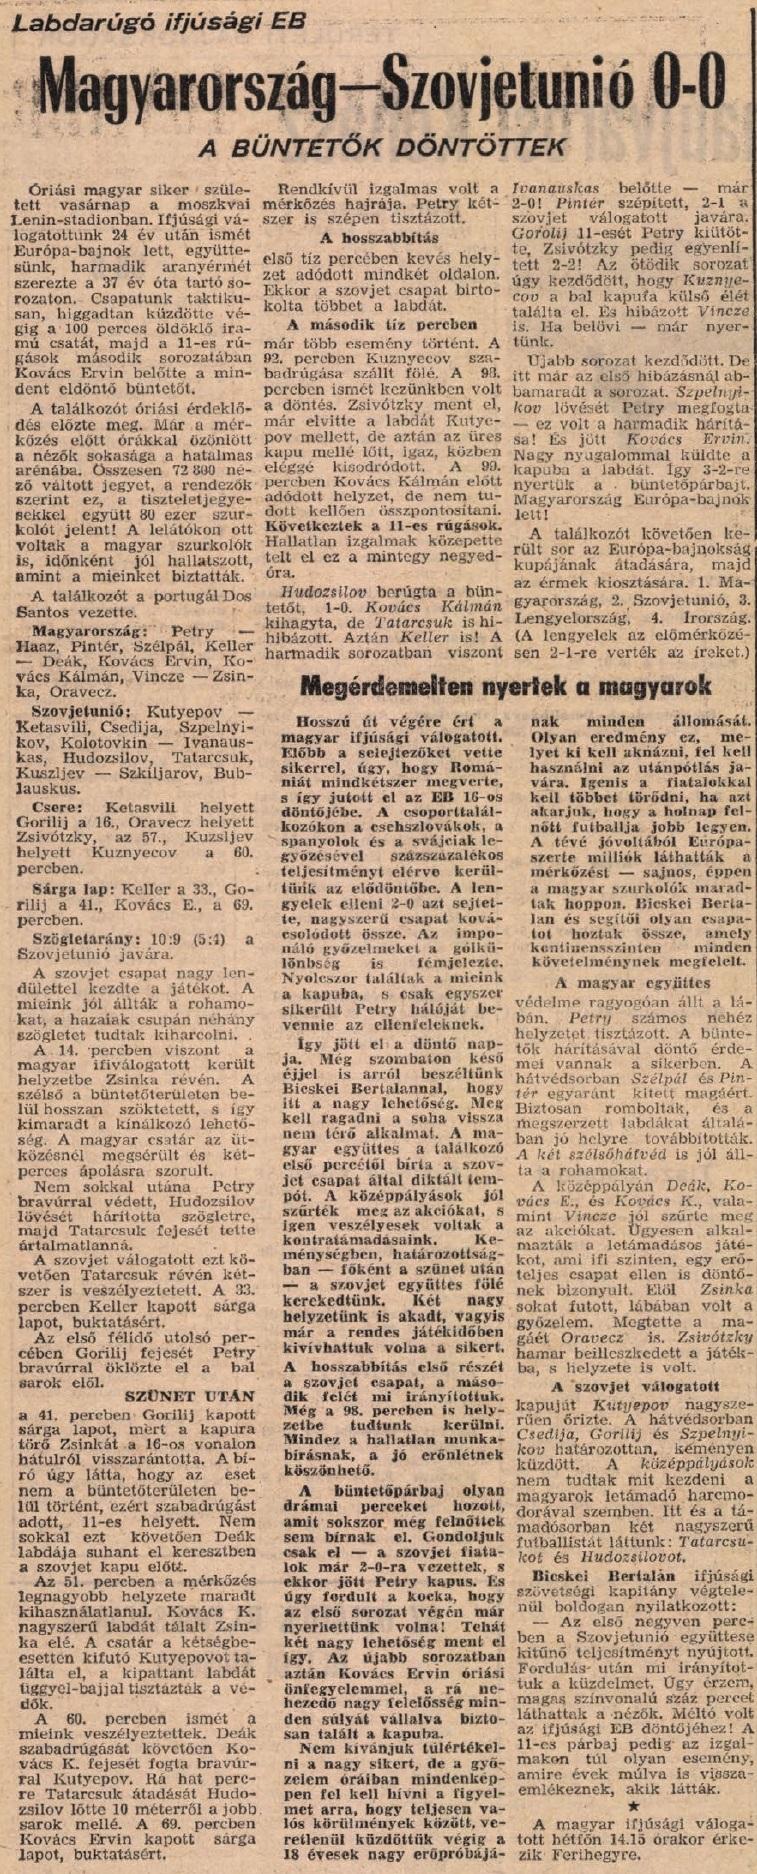 idokapszula_nb_i_1983_84_30_fordulo_ifjusagi_labdarugo_eb_magyarorszag_szovjetunio.jpg